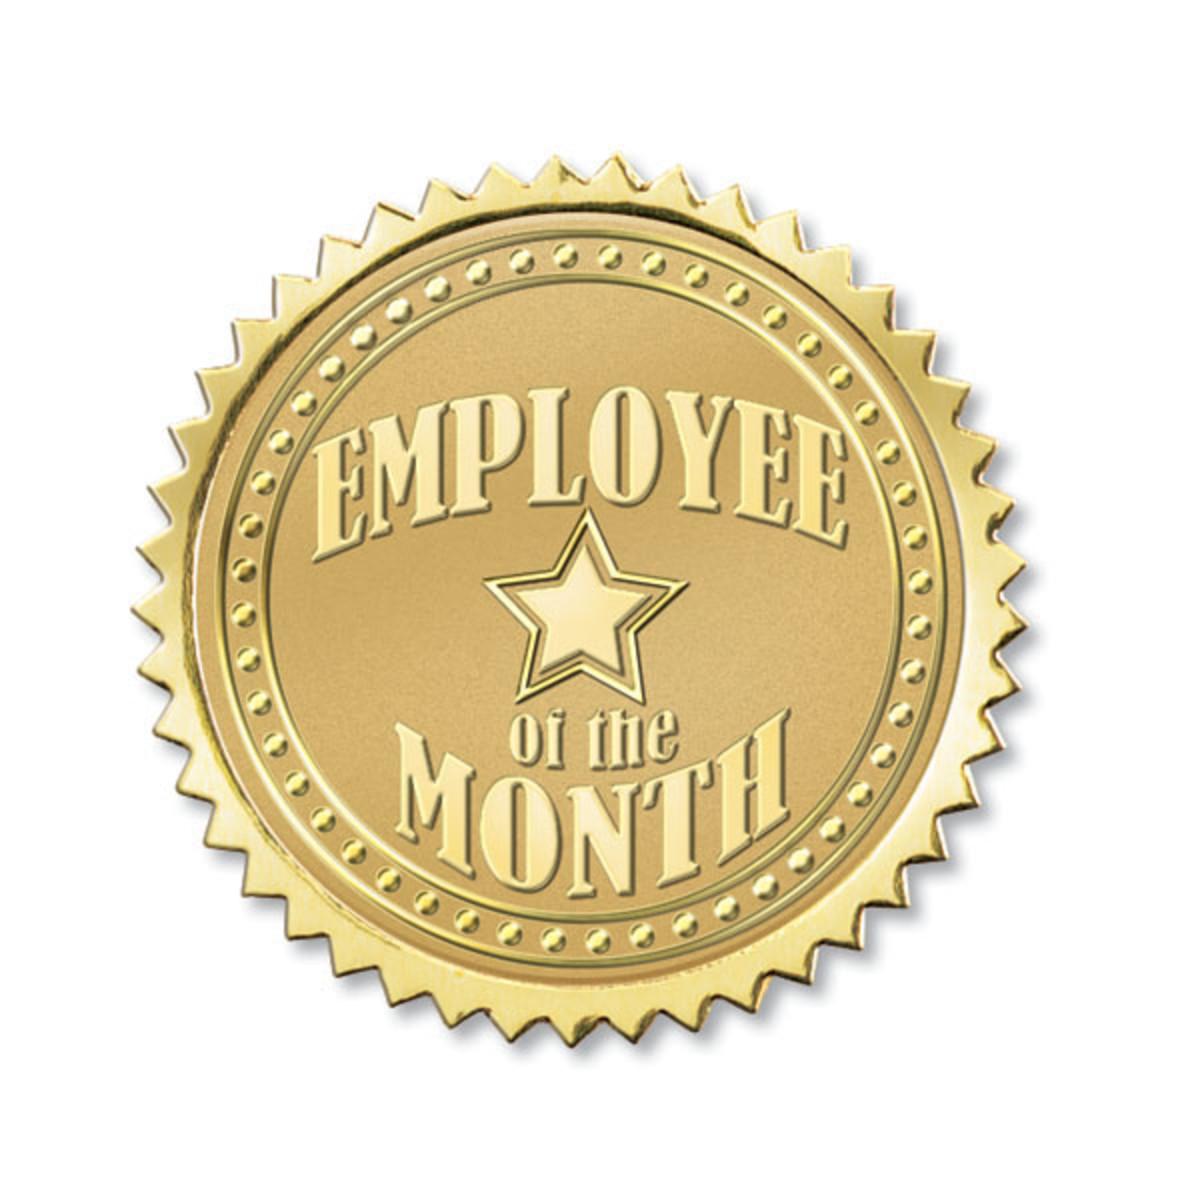 16-non-pecuniary-ways-to-motivate-employees